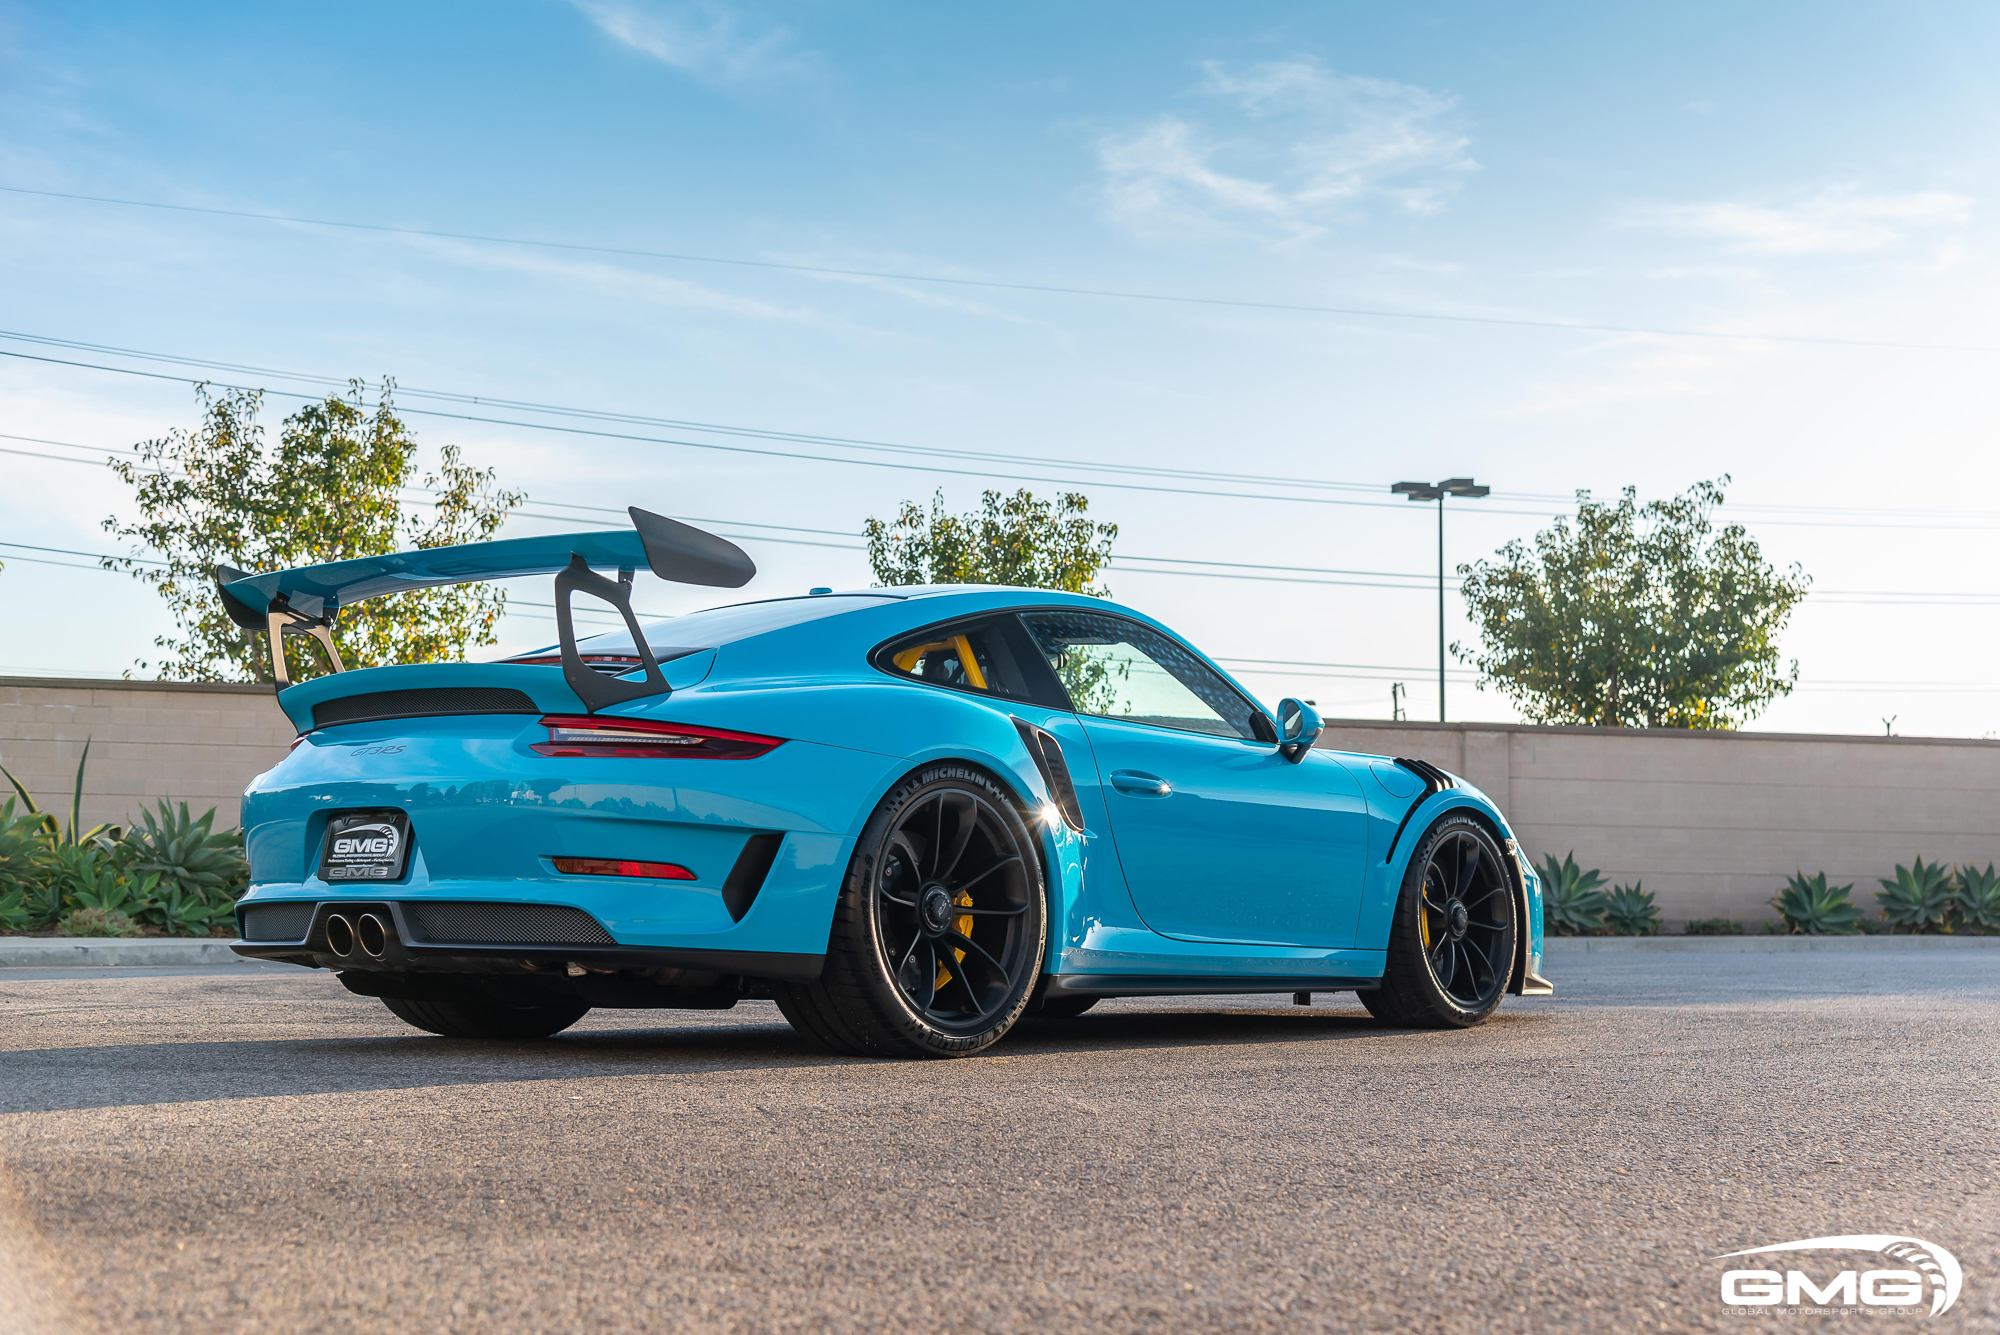 Miami Blue Porsche 991 2 Gt3 Rs Gmg Racing